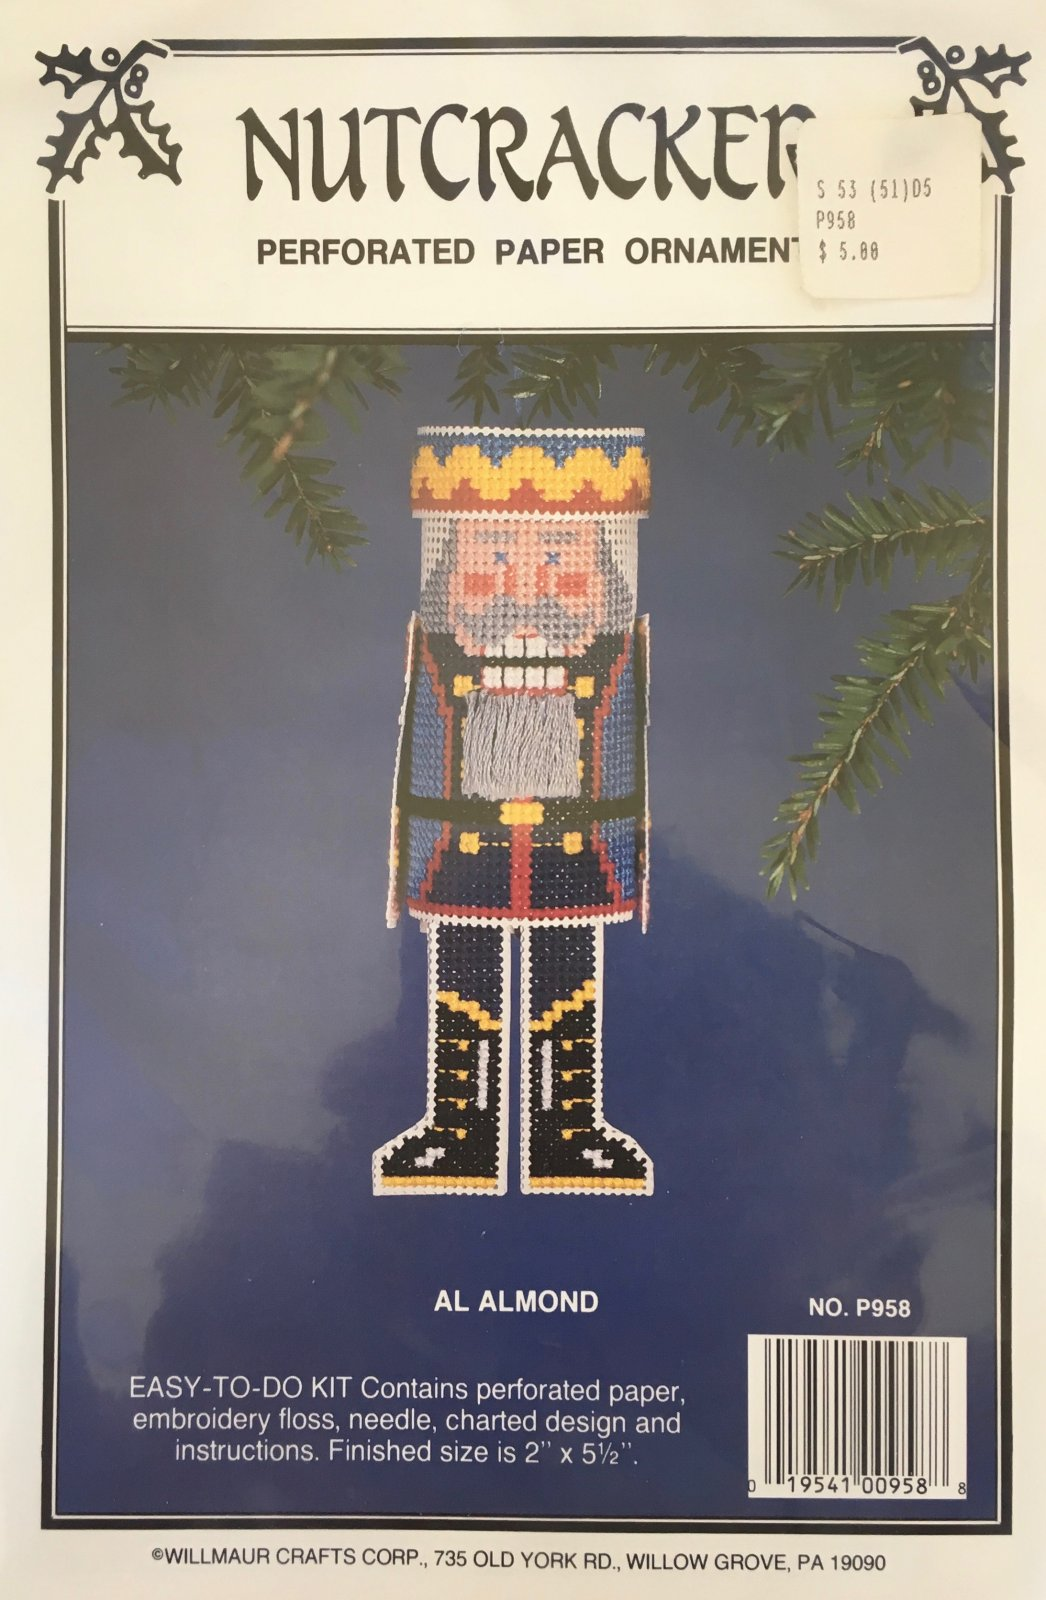 Astor Place: Nutcracker Al Almond Kit P958